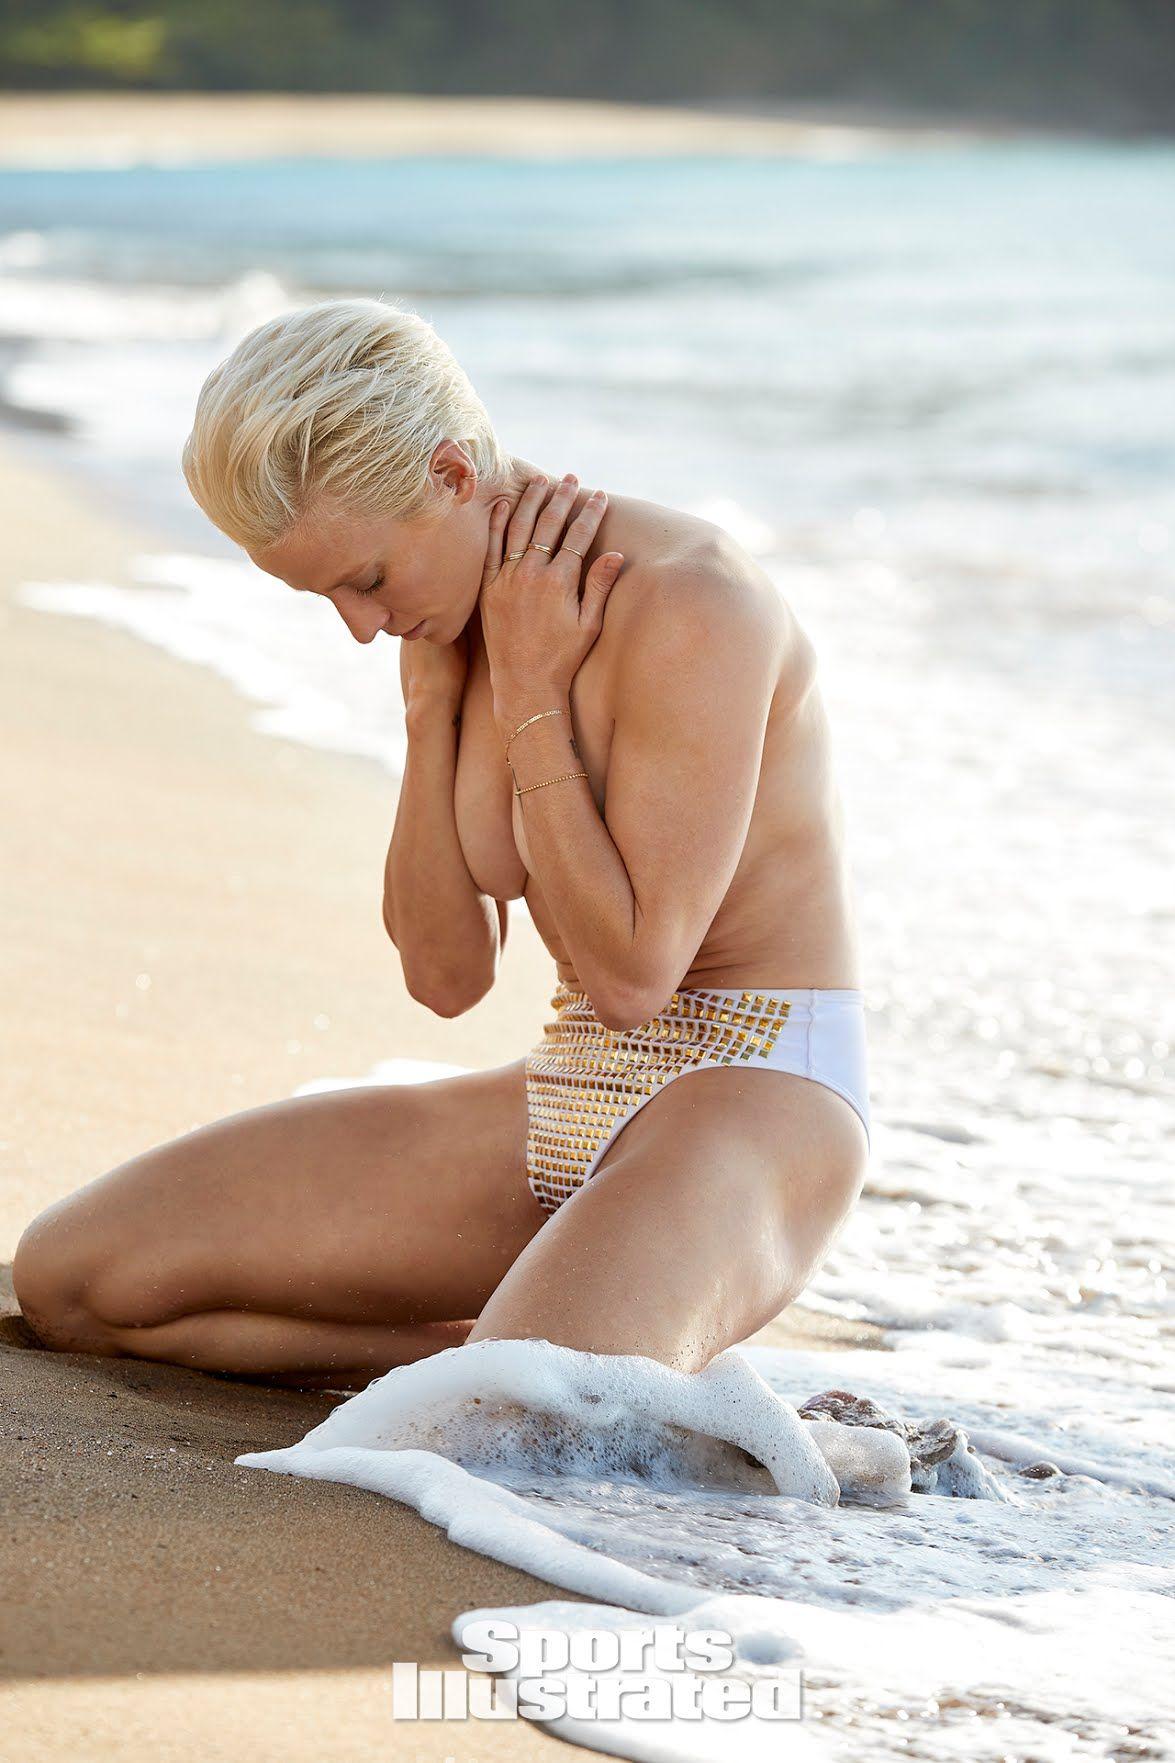 Megan Rapinoe Uswnt 2019 Sports Illustrated Swimsuit Issue